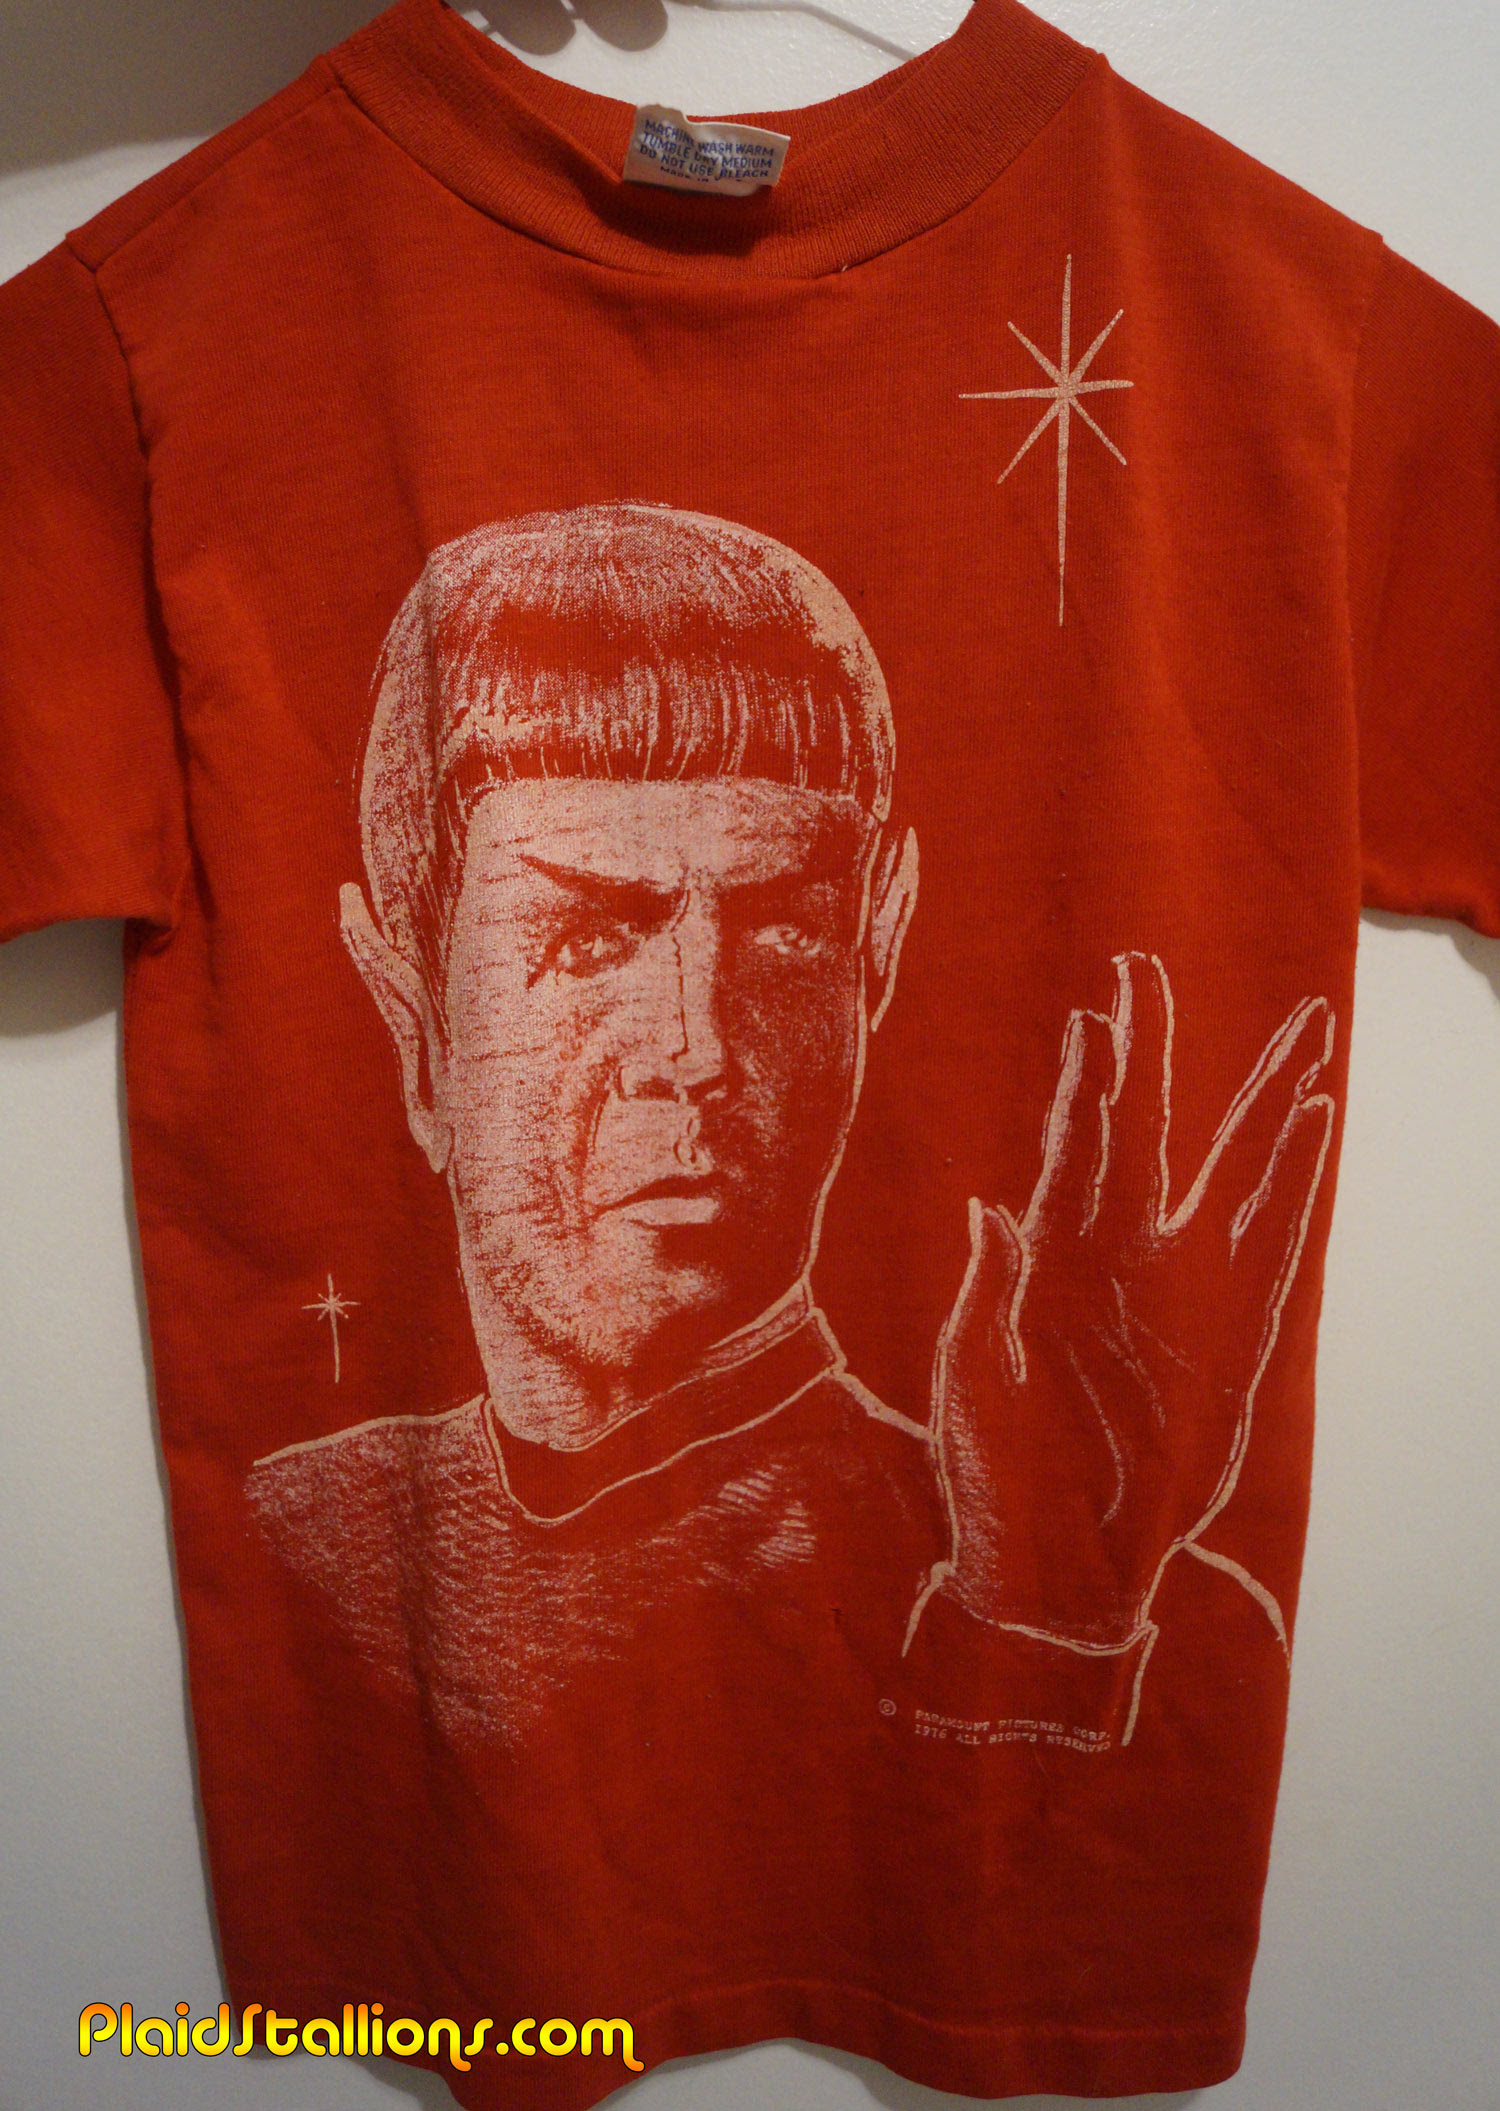 donmoor spock shirt